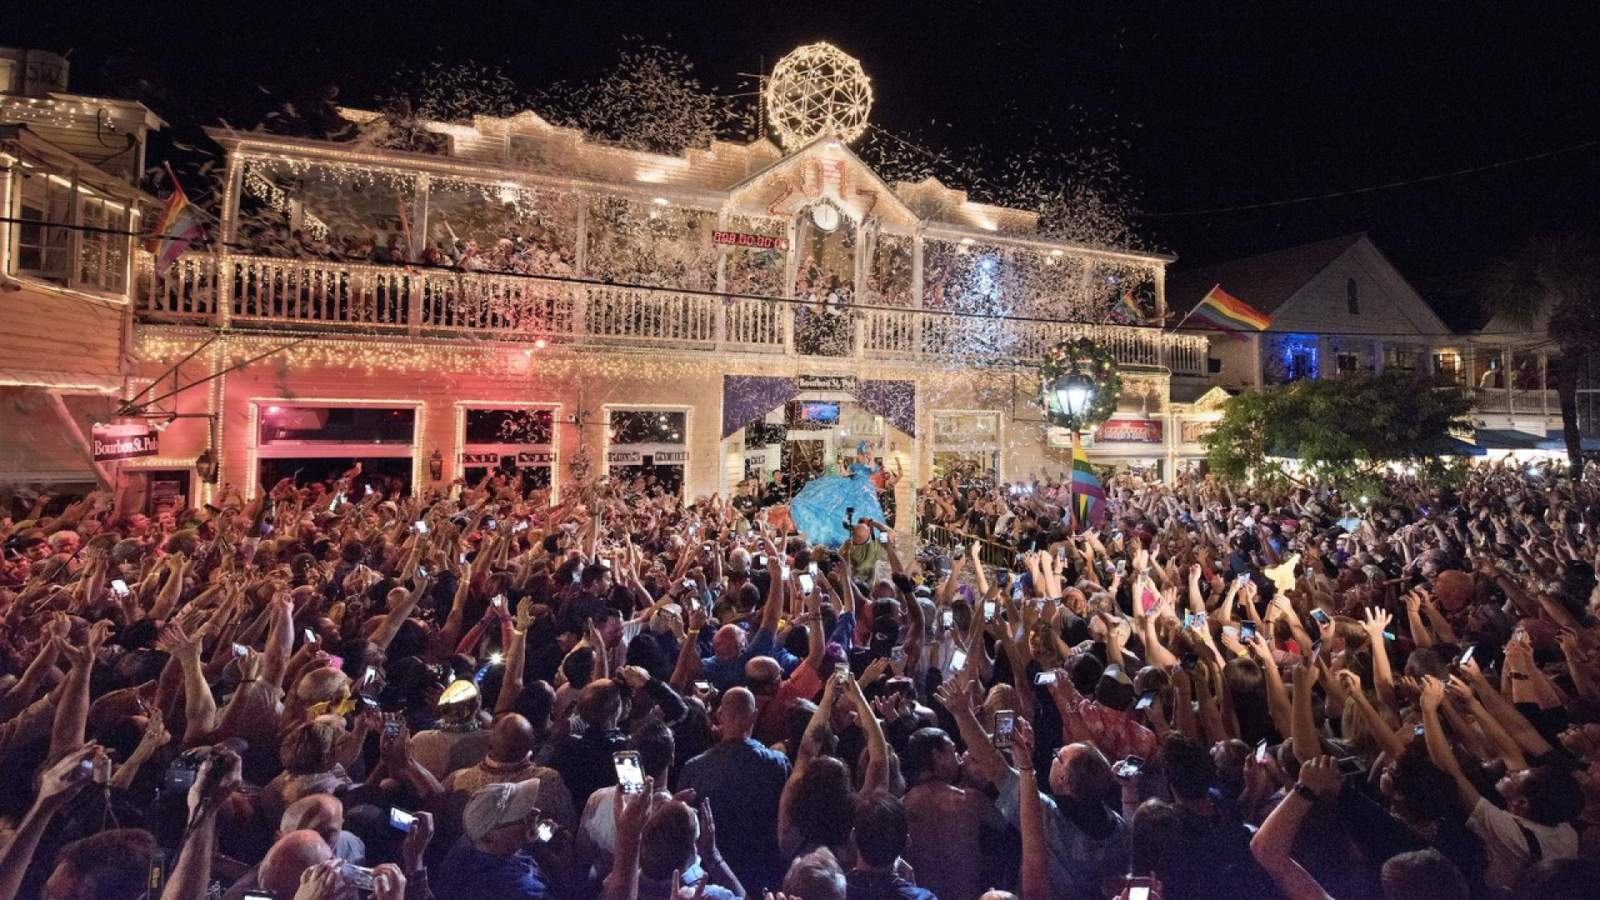 Key West scales back New Year's Eve because of coronavirus - WJXT News4JAX